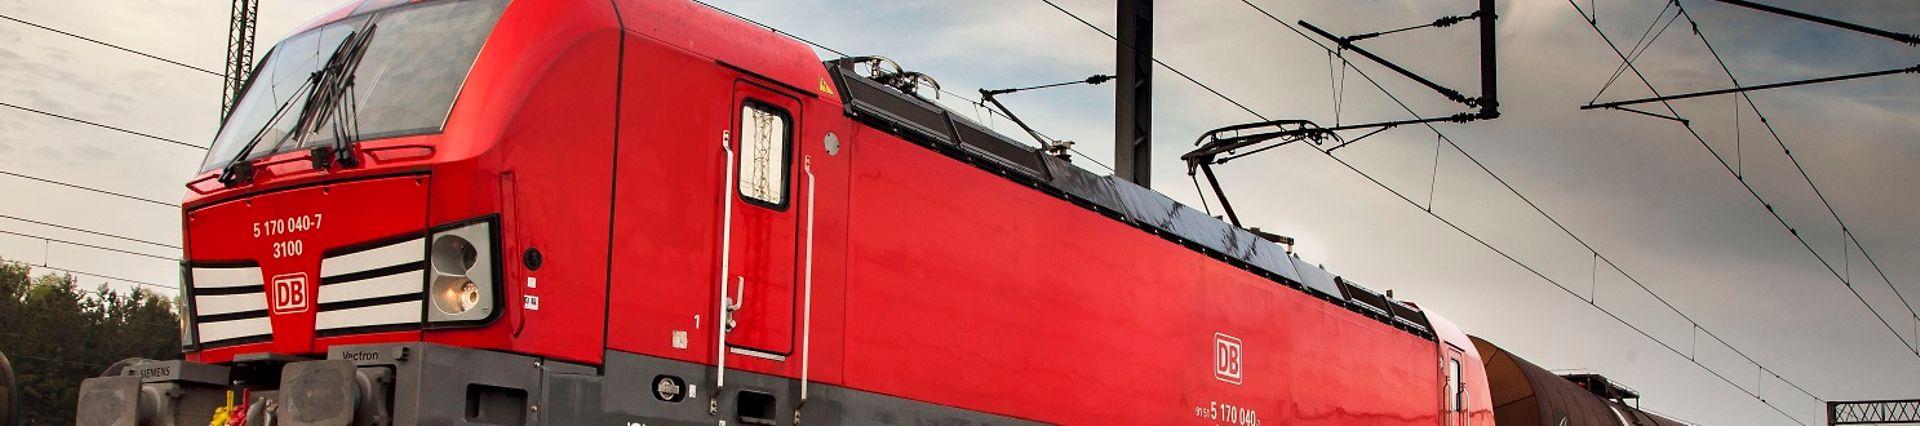 DB Cargo_PL_DB97987